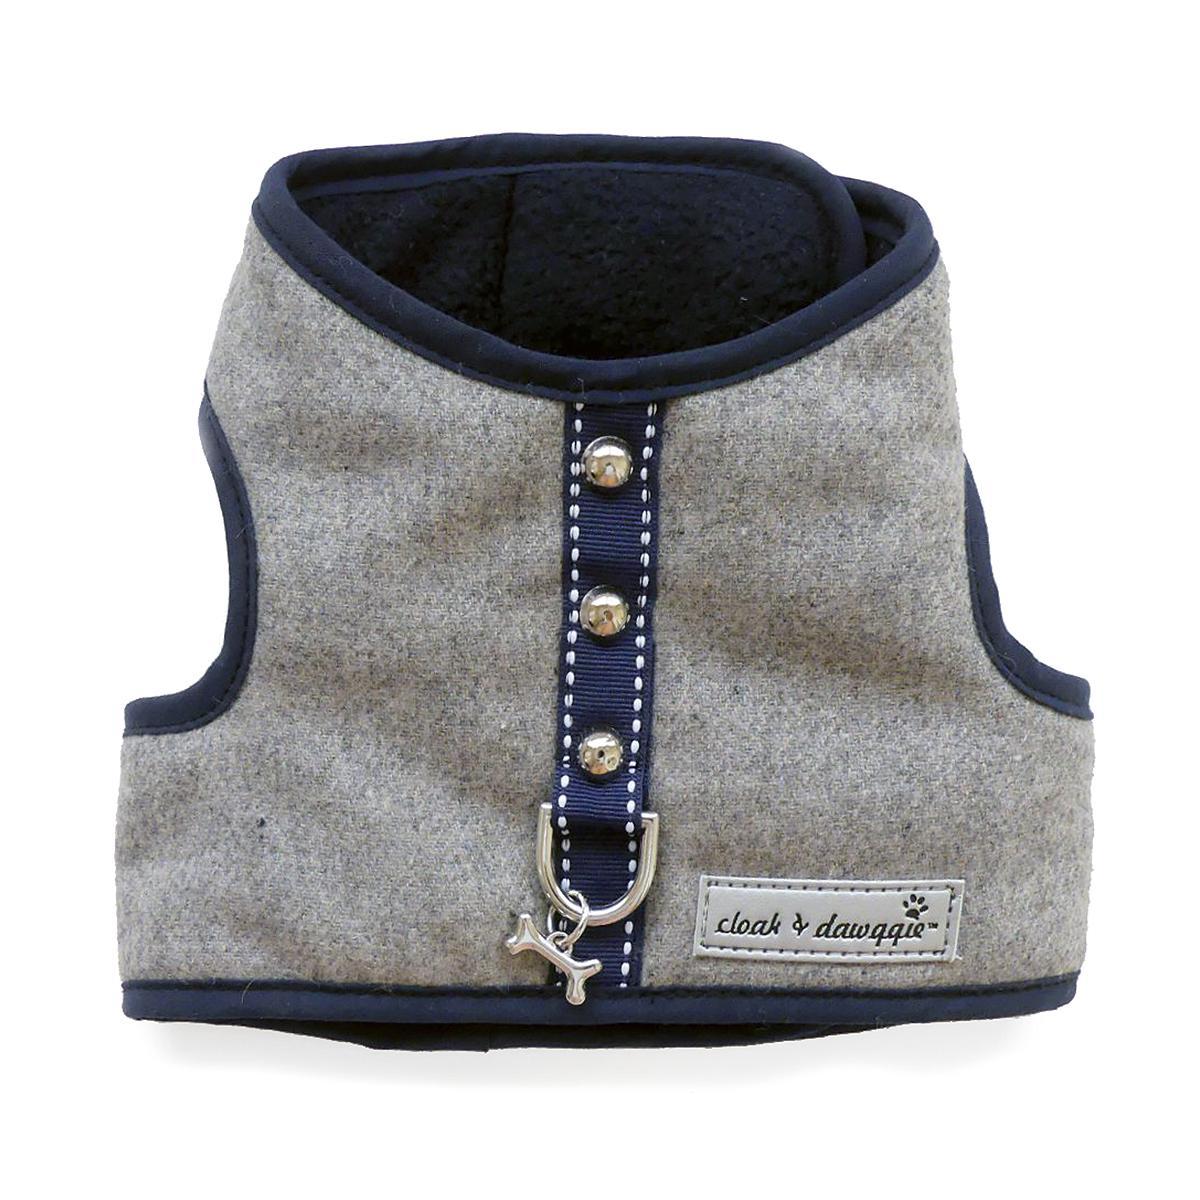 Cloak & Dawggie Flannel Teacup Dog Harness - Navy